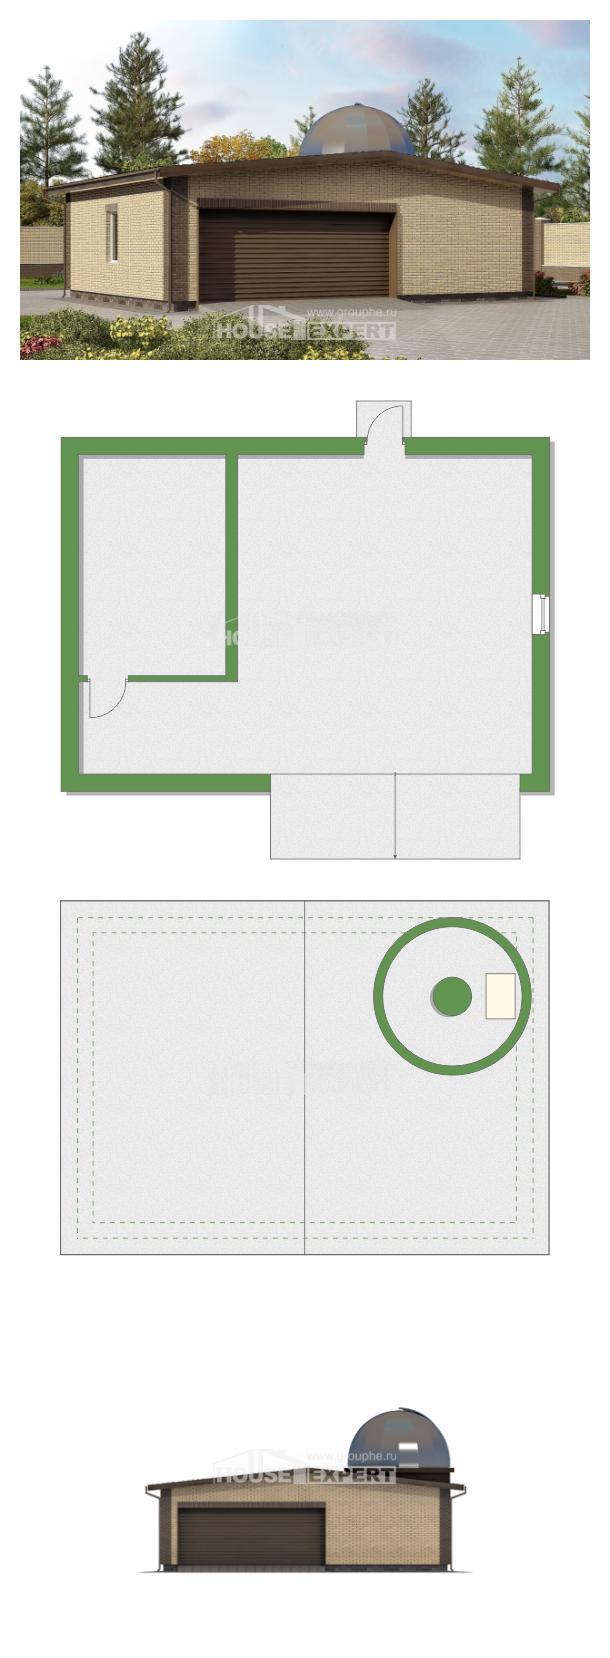 Projekt domu 075-001-L   House Expert